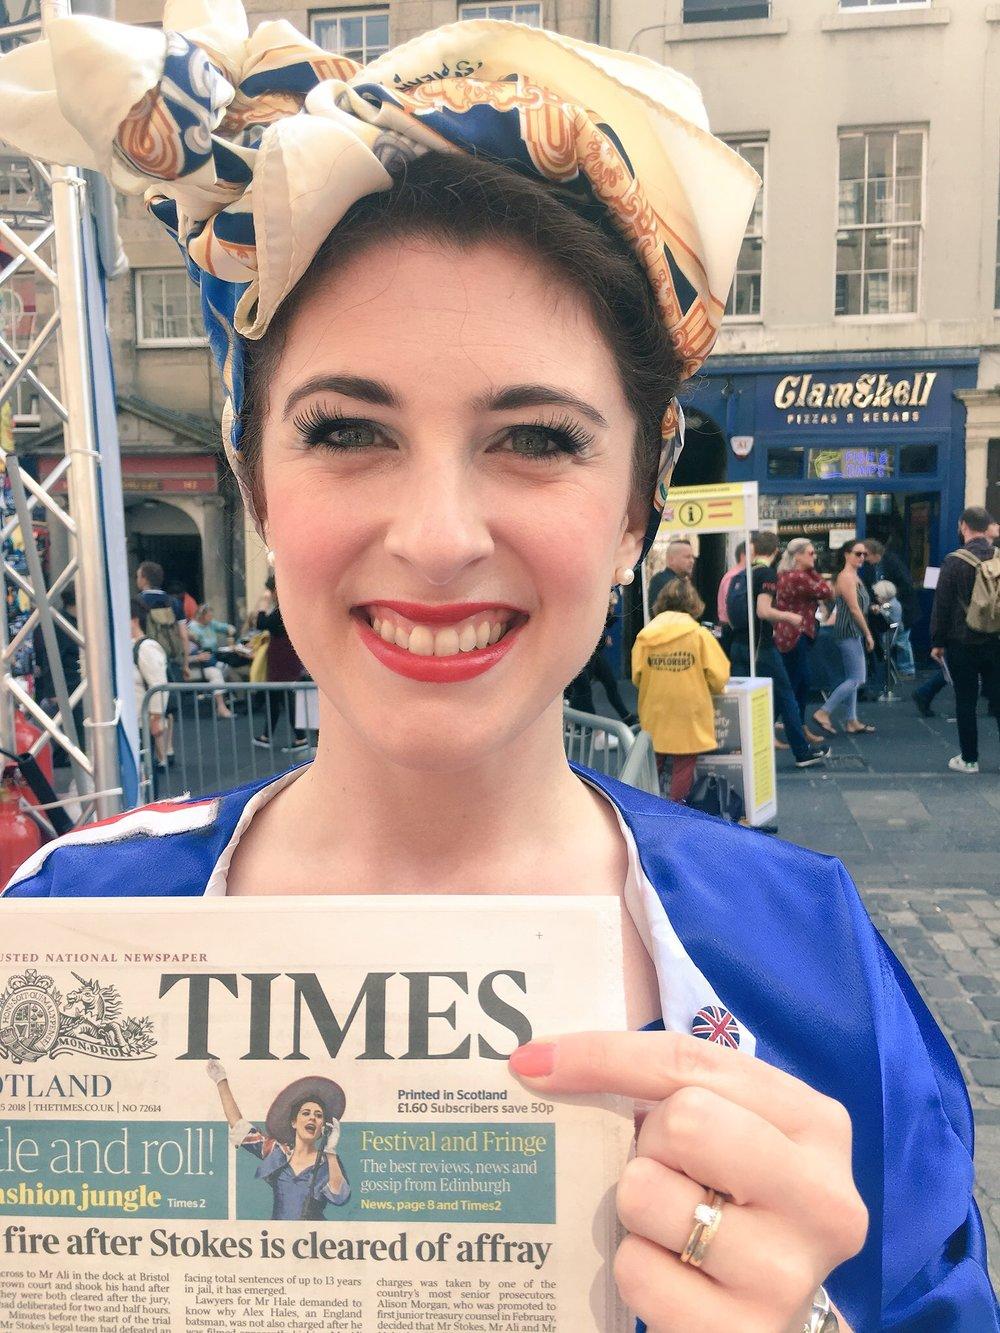 Ashleigh - The Times Newspaper  Photo credit: Nicholas Maude